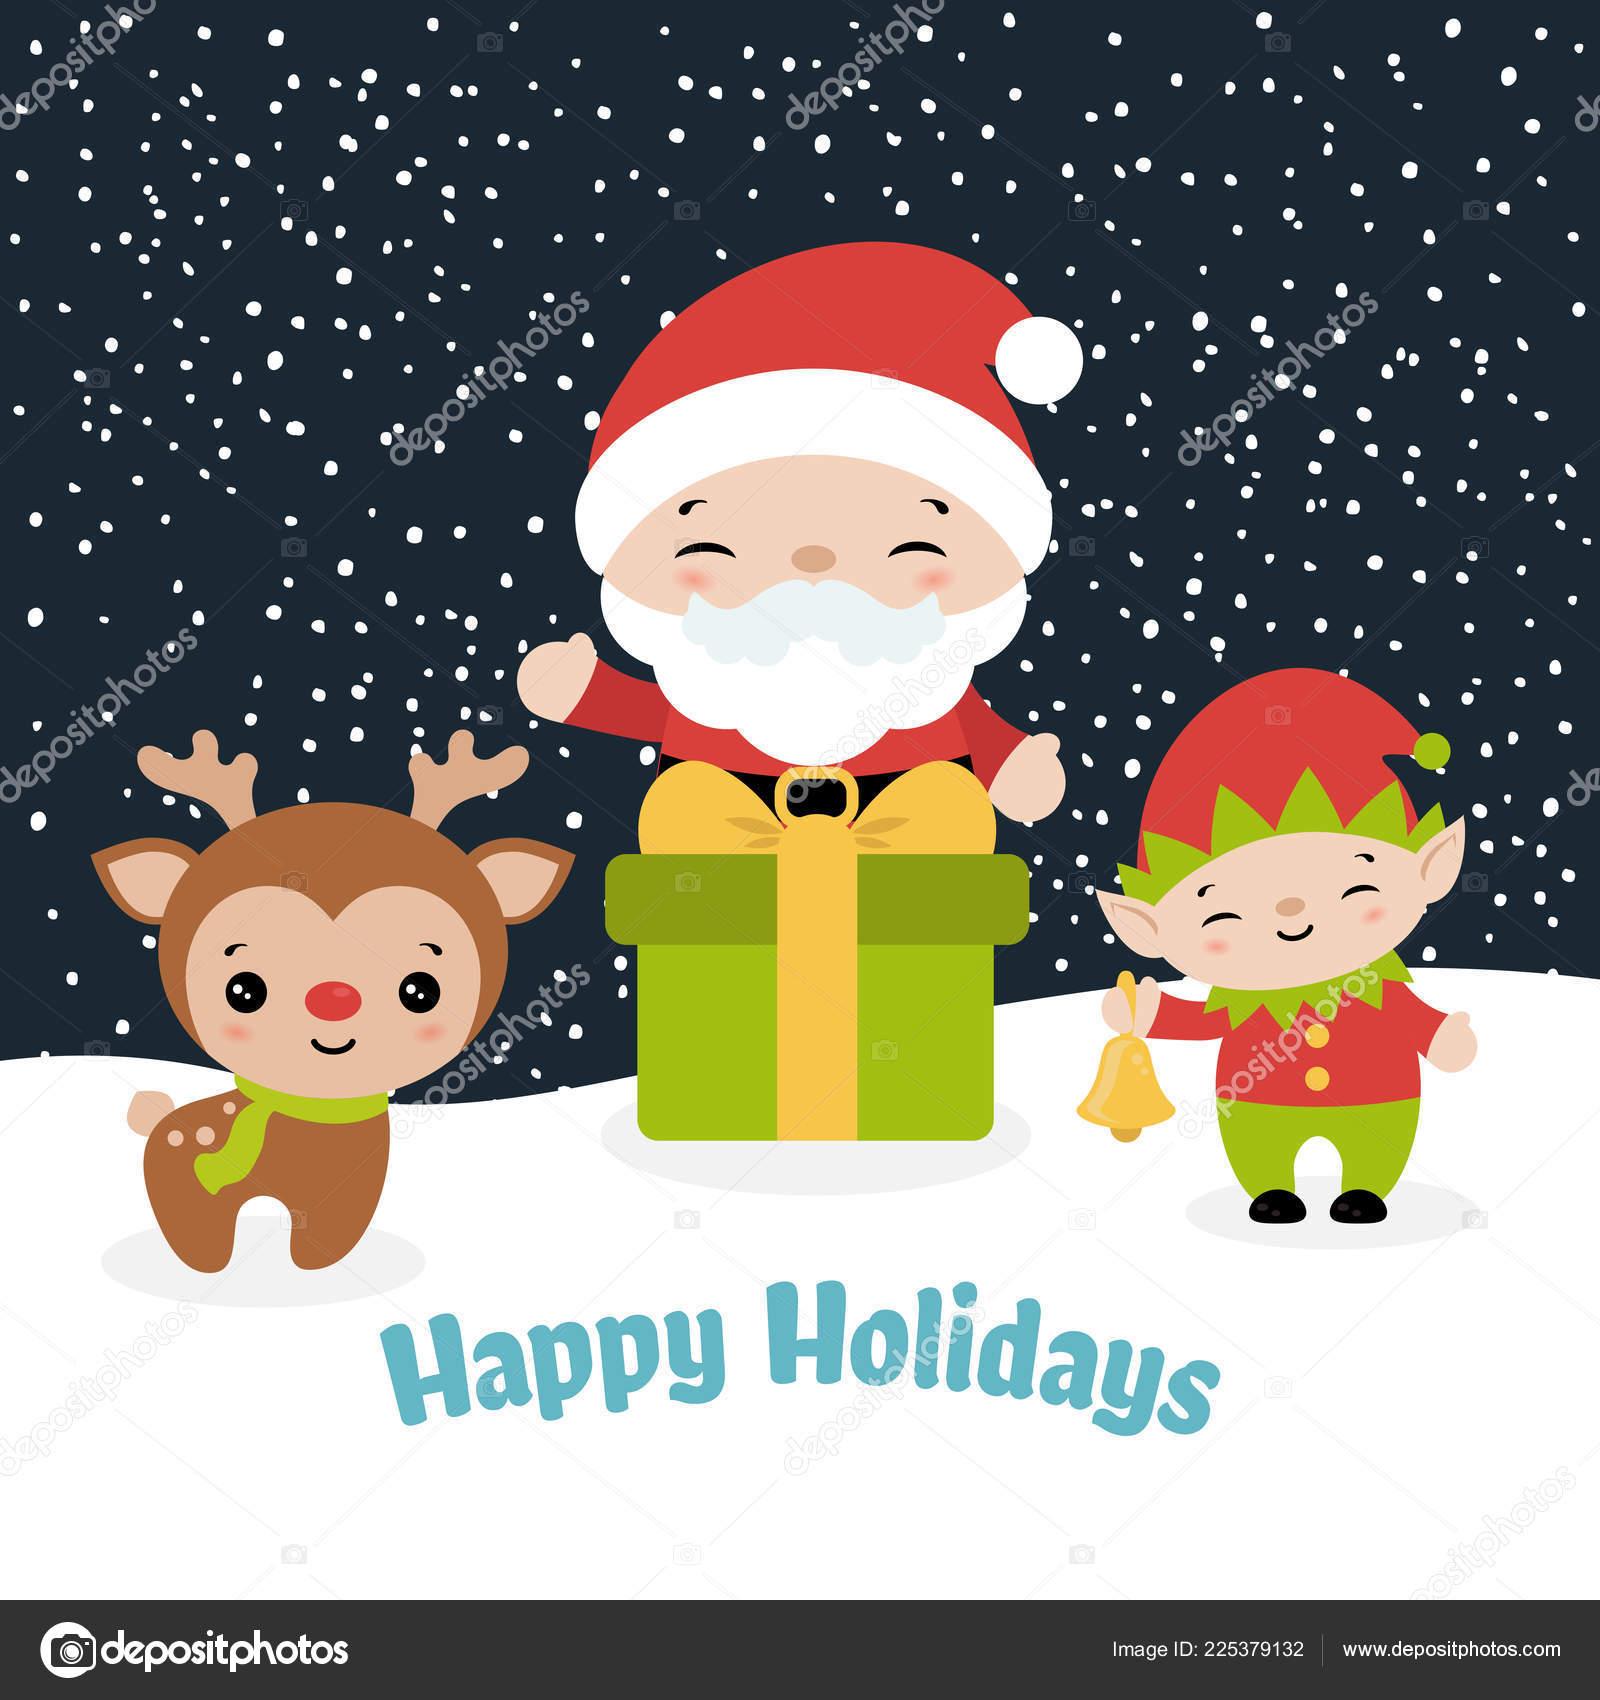 Merry Christmas Card Santa Claus Raindeer Elf Vector Illustration U2014 Stock  Vector